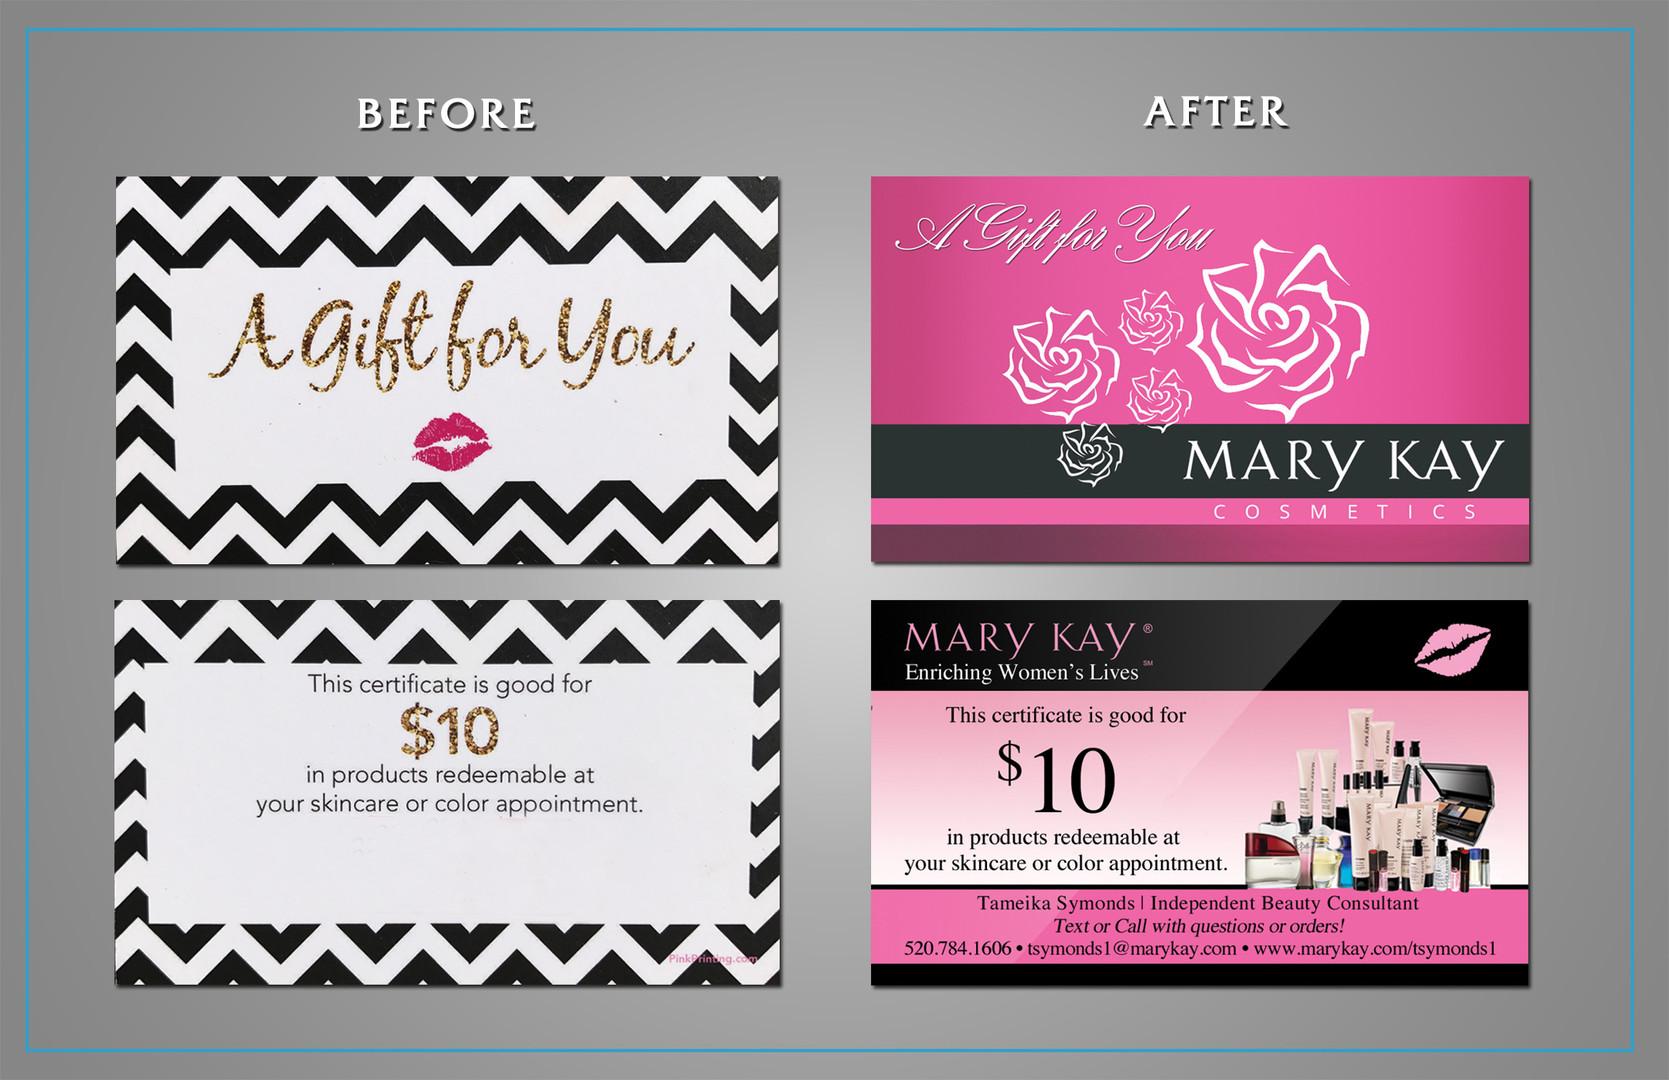 Before After_ BC_MARY KAY.jpg